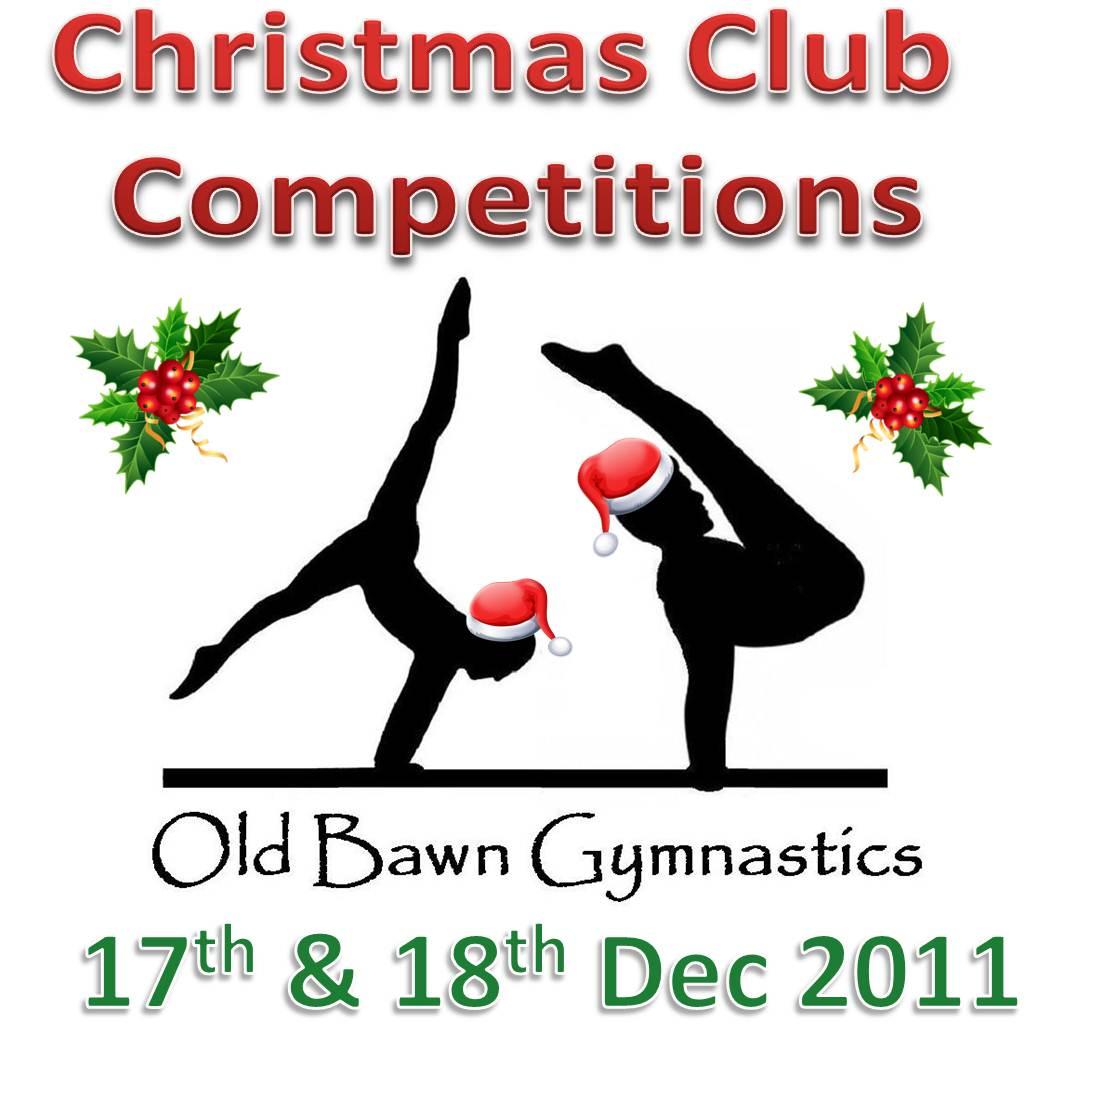 December 2011 Old Bawn Gymnastics